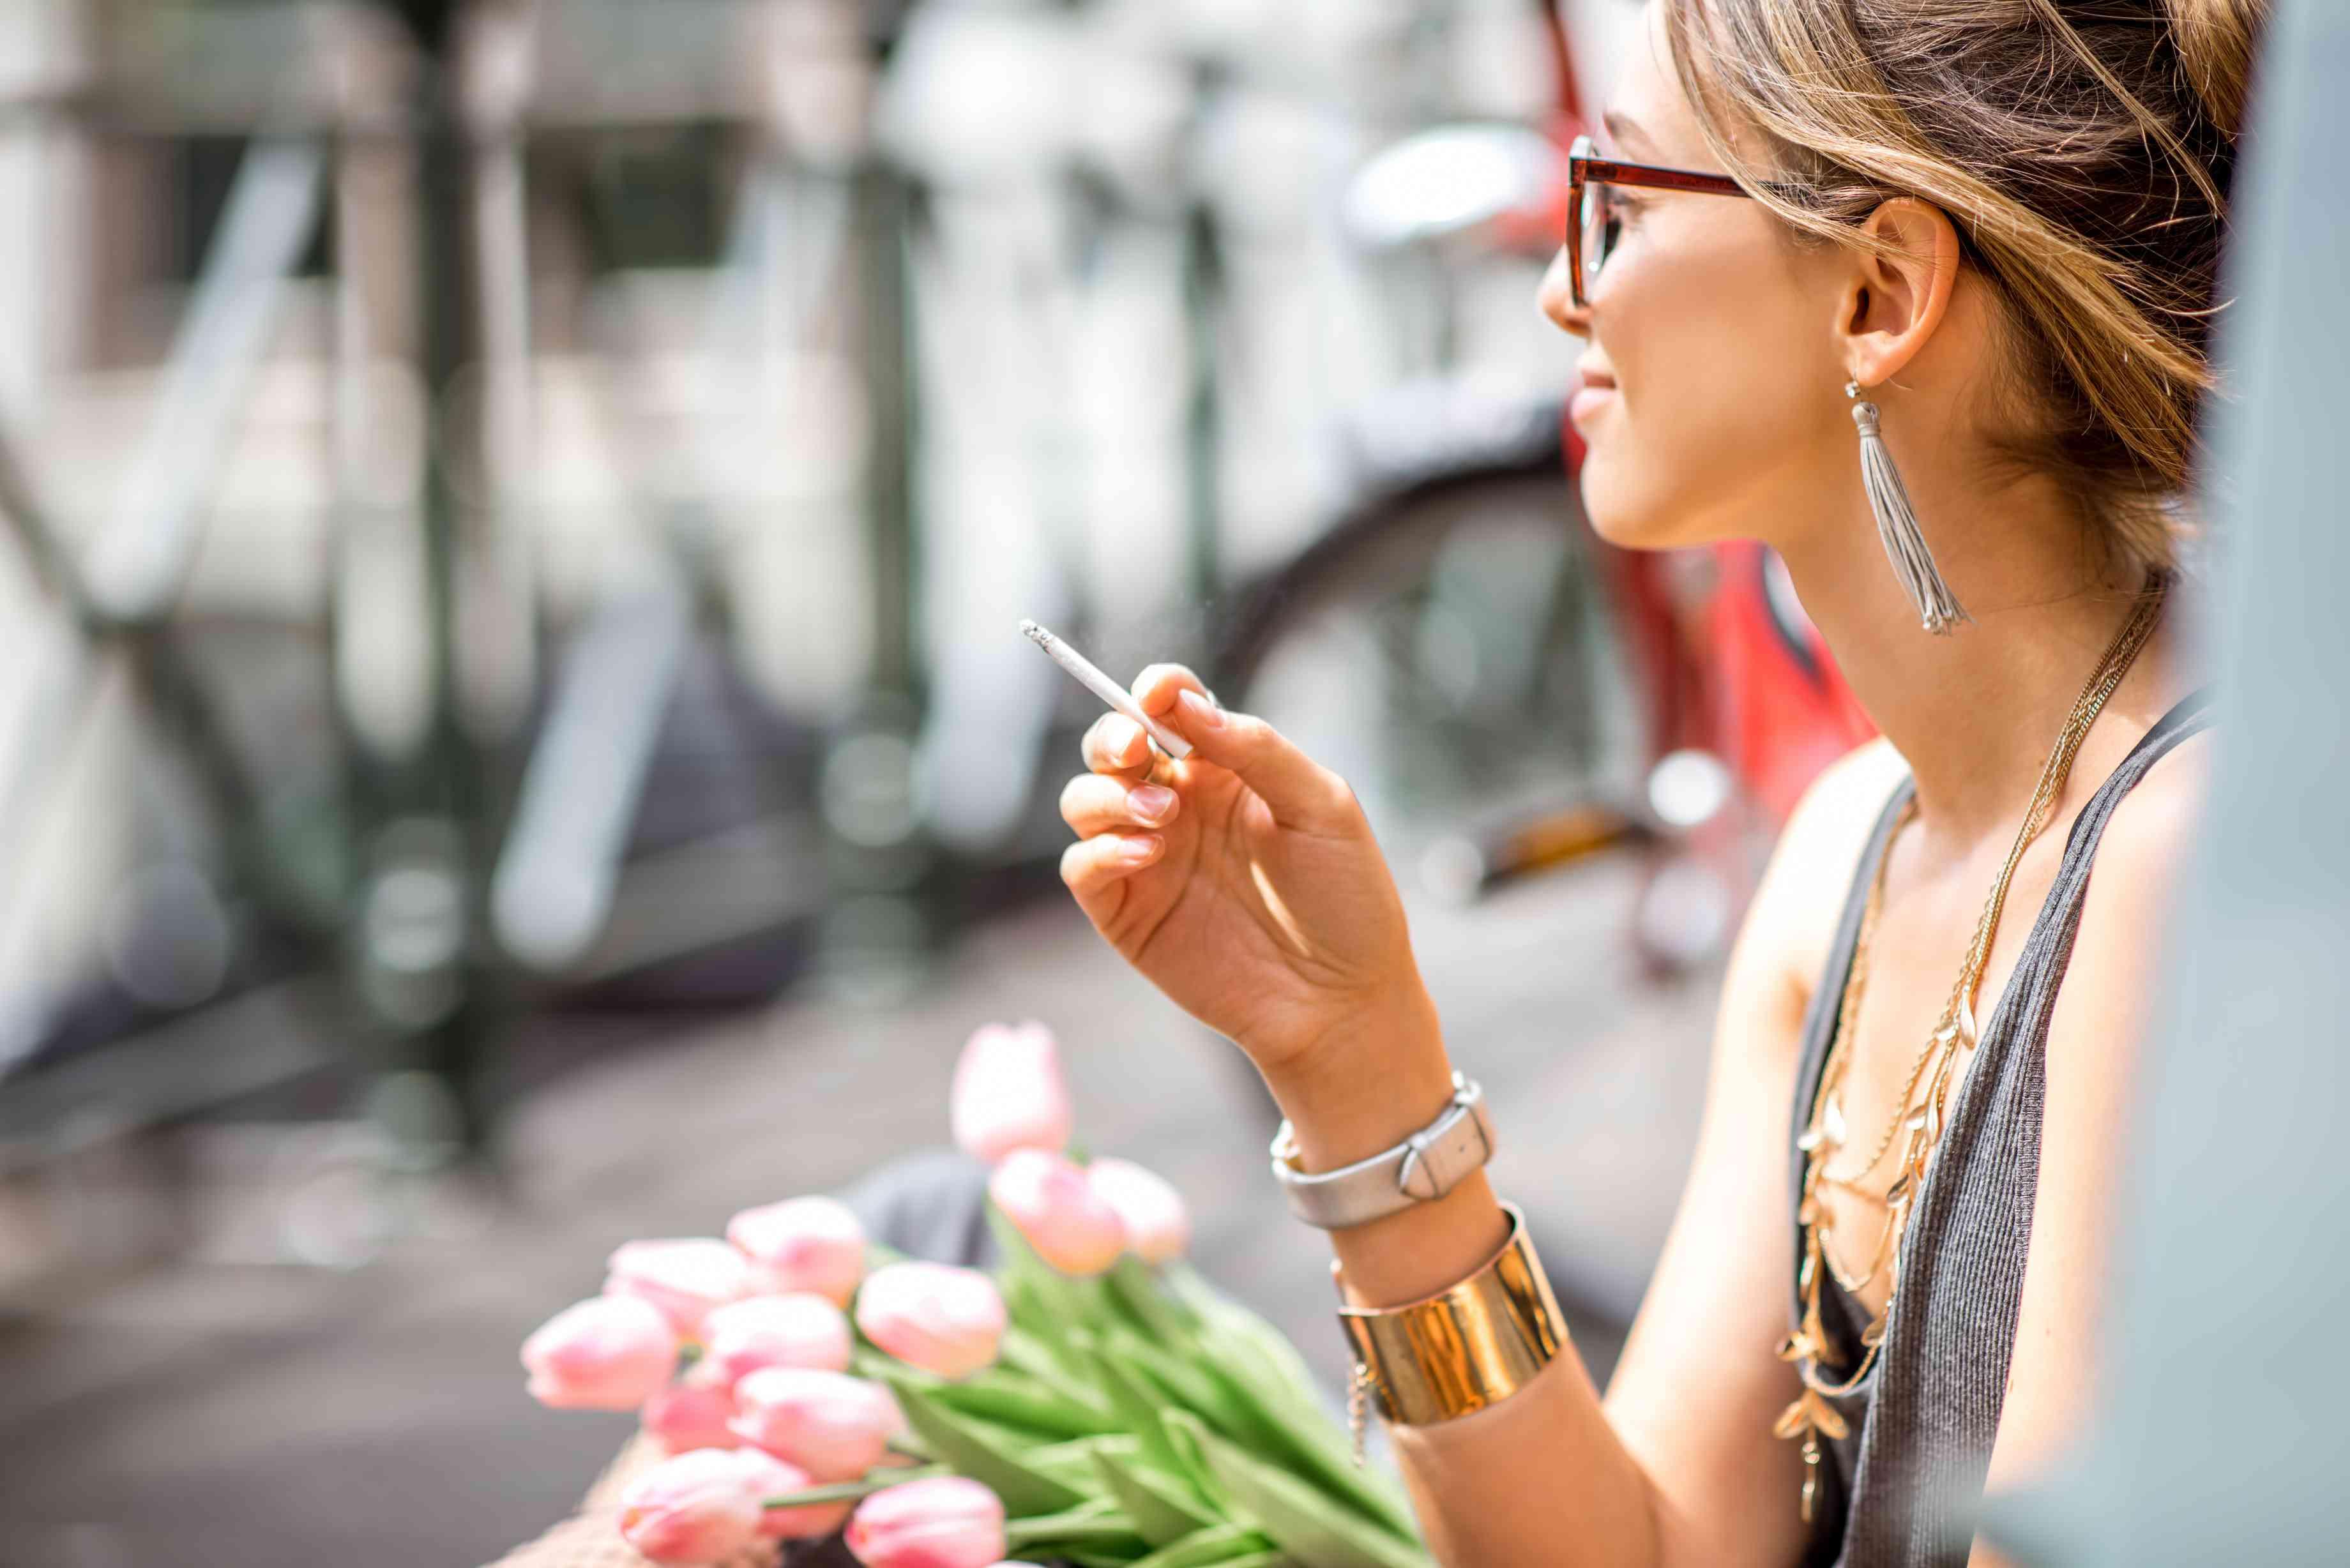 Woman smoking in Amsterdam city